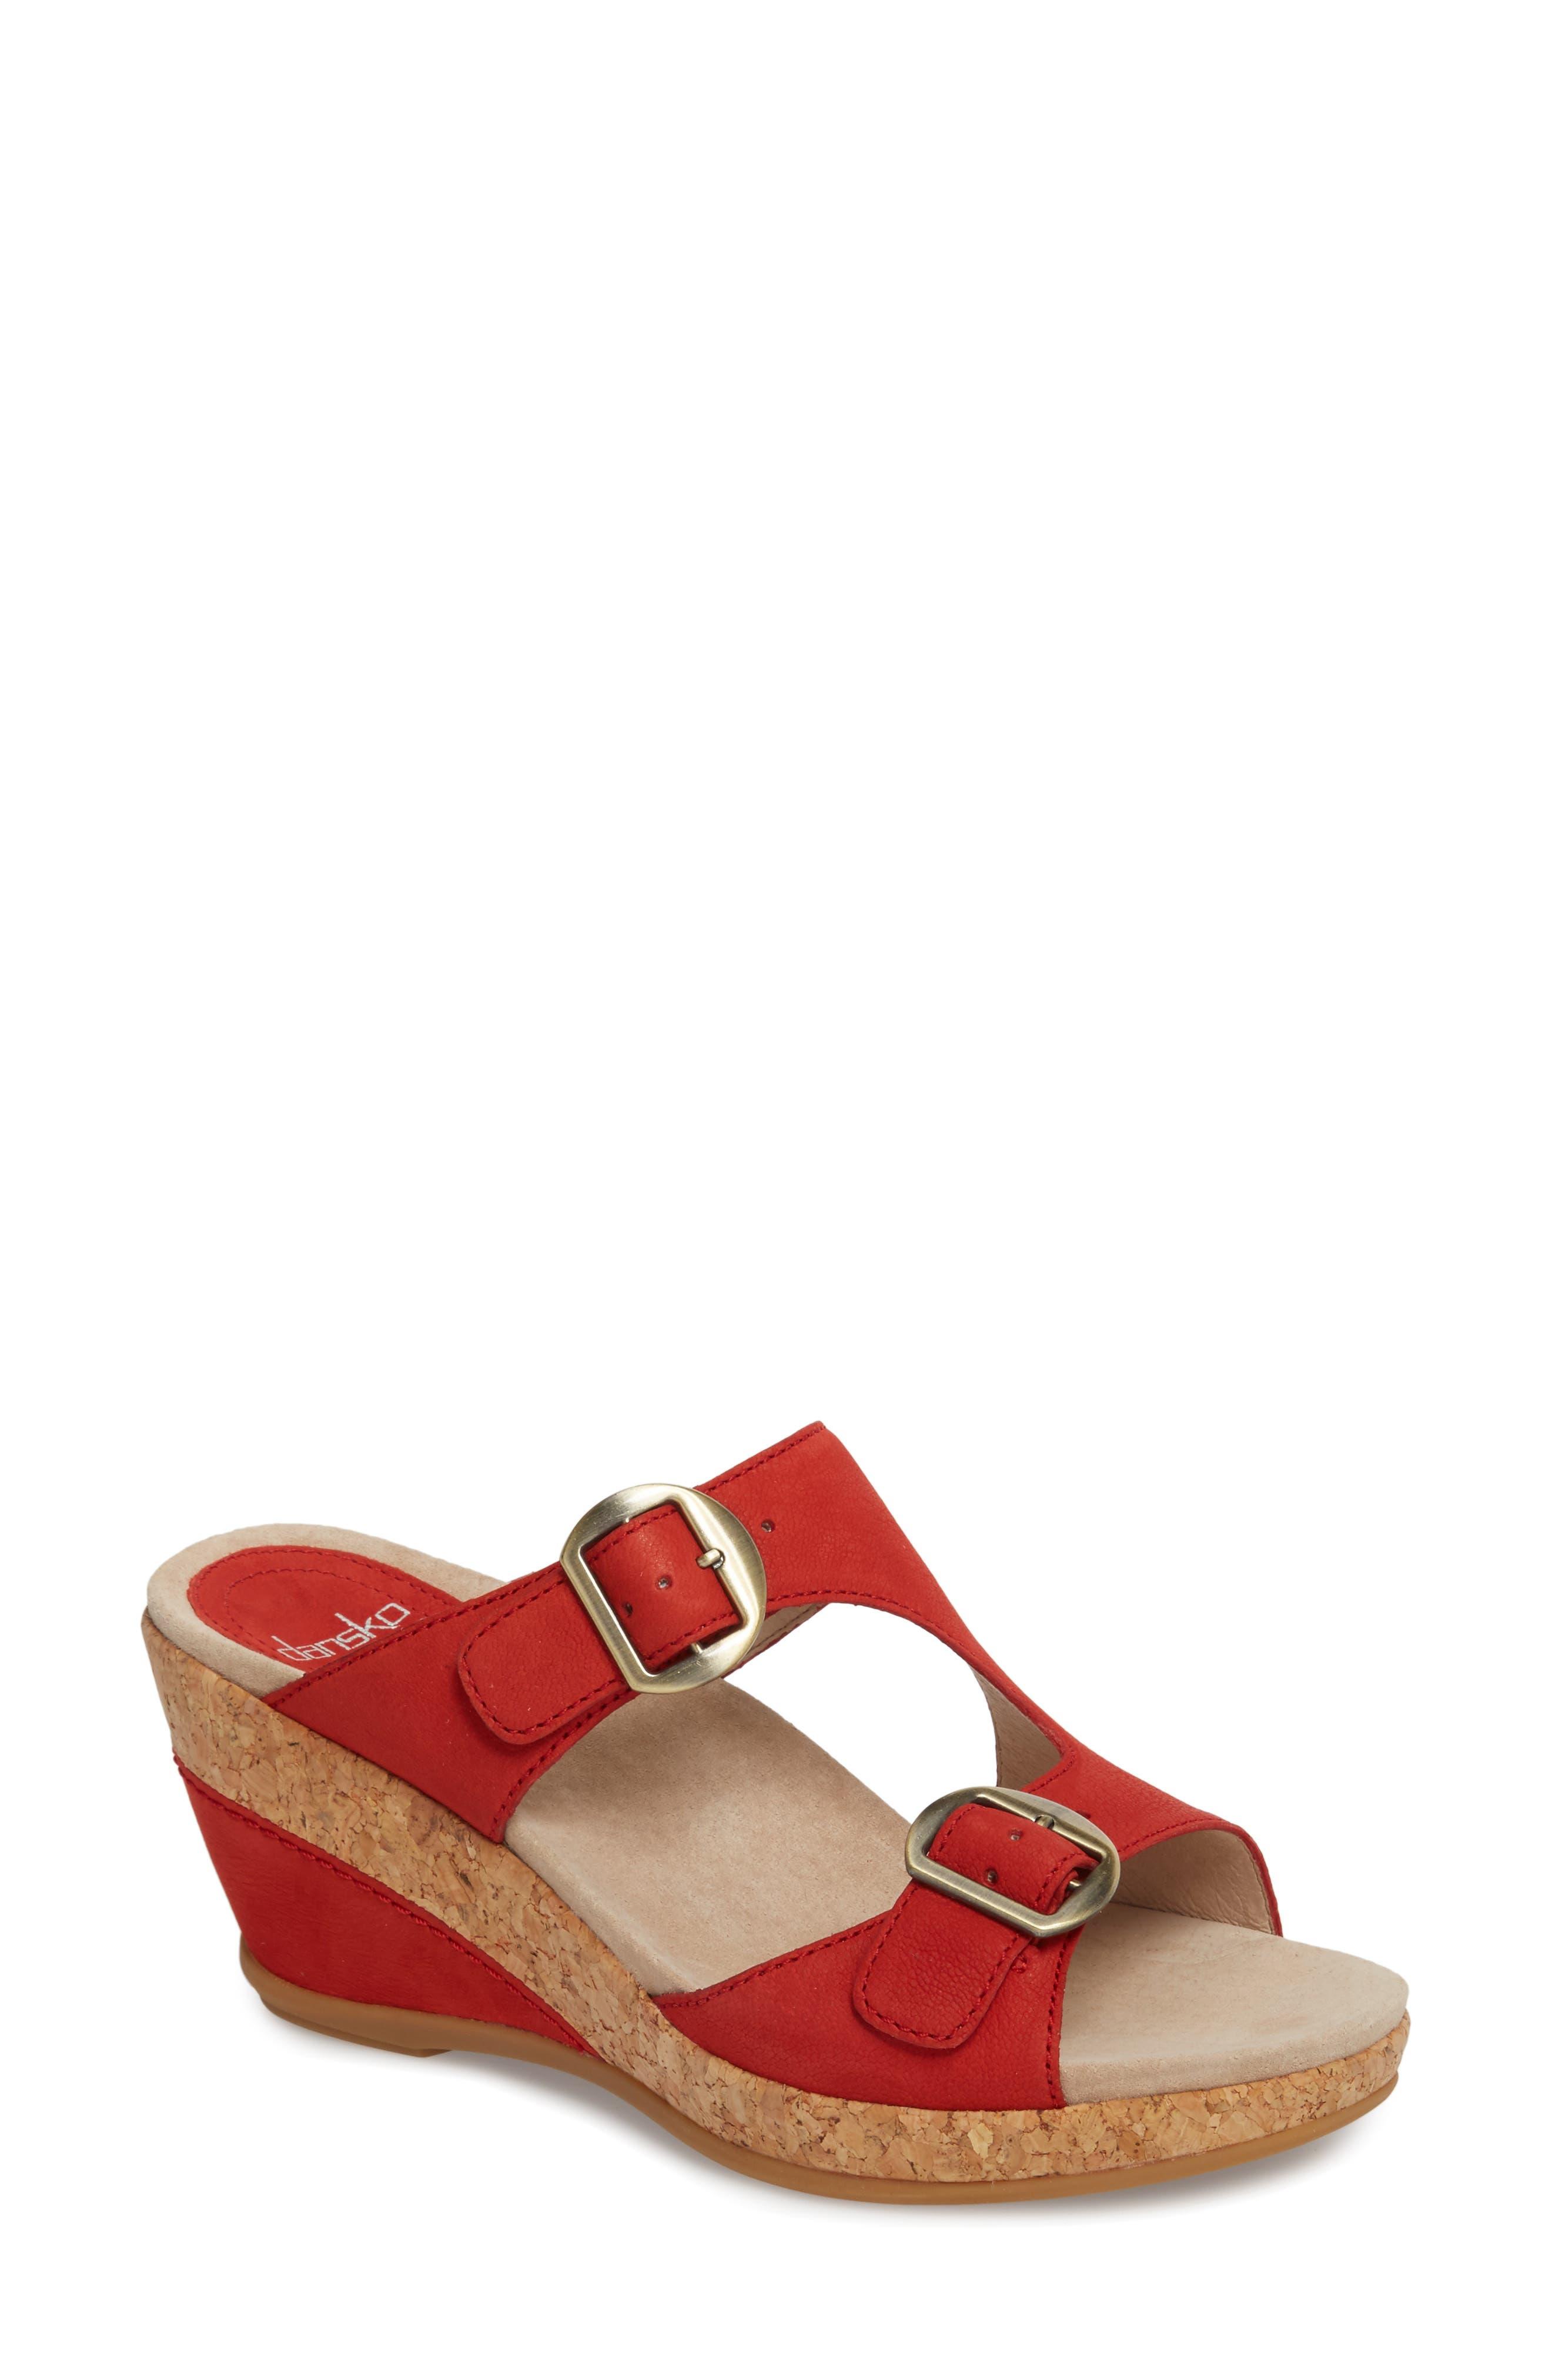 Carla Wedge Slide Sandal,                             Main thumbnail 1, color,                             Tomato Milled Nubuck Leather